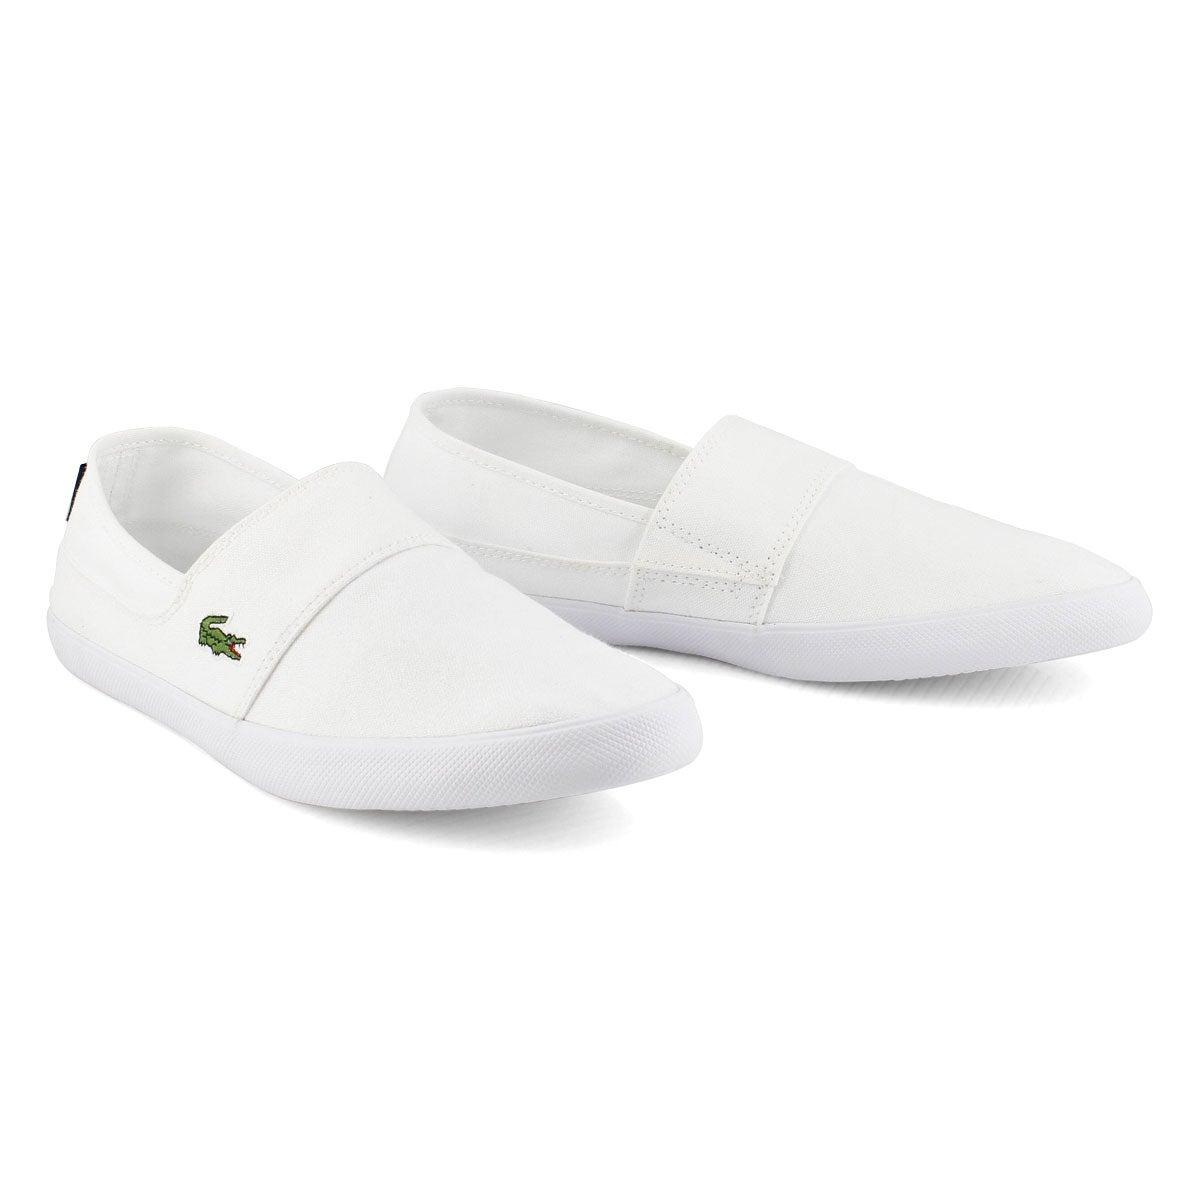 Marice BL 2 Casual Slip On Shoe